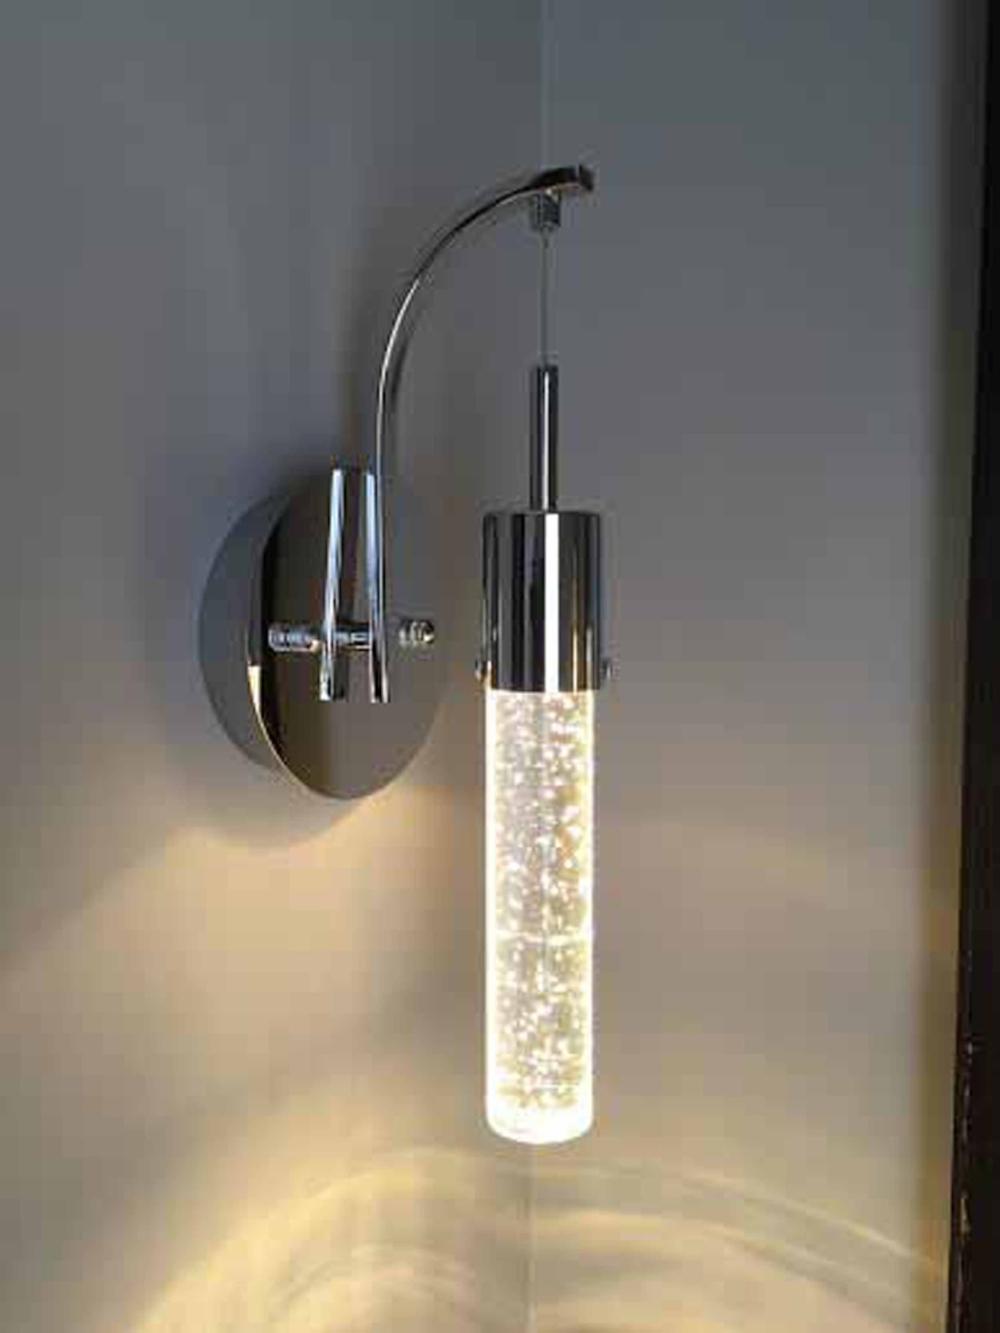 robinson lighting 2083116.jpg